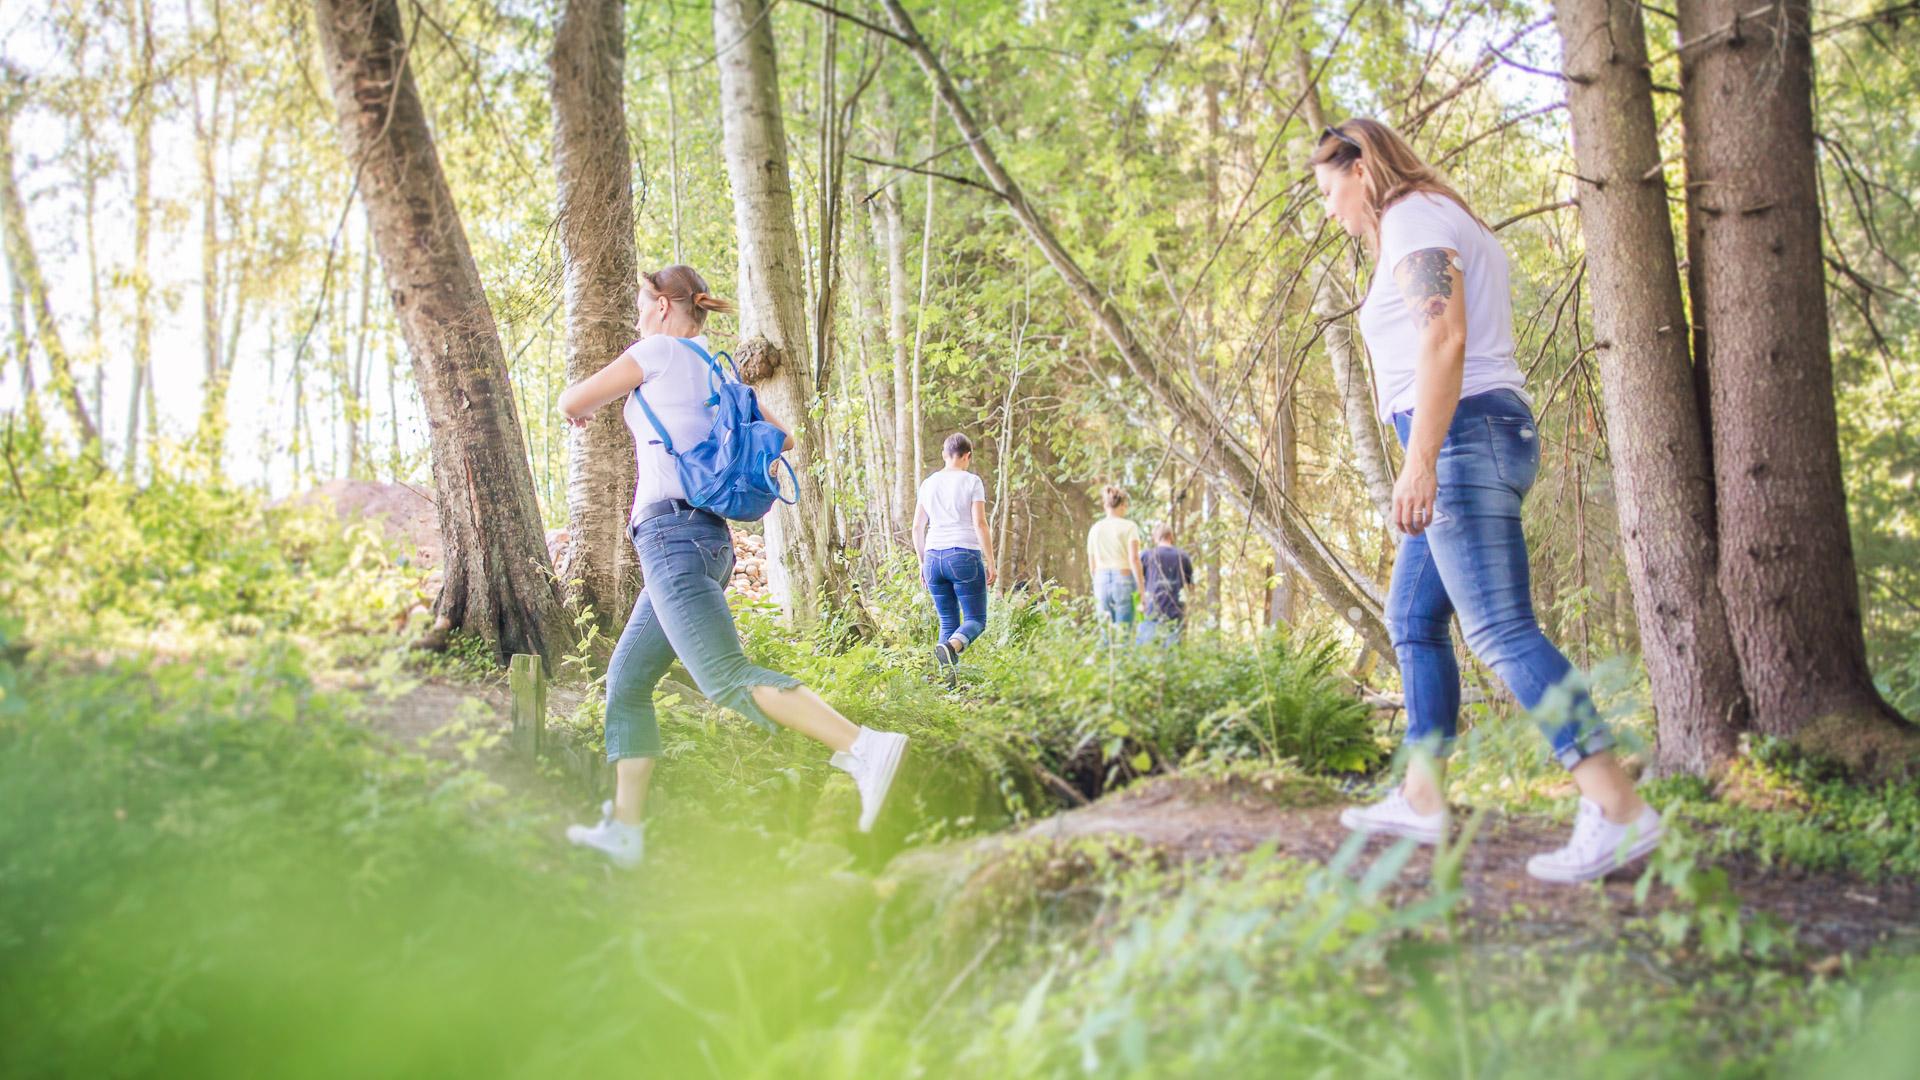 Visit Tampere Korsuretket Patikointi Hiking Forest Nature Laura Vanzo 10